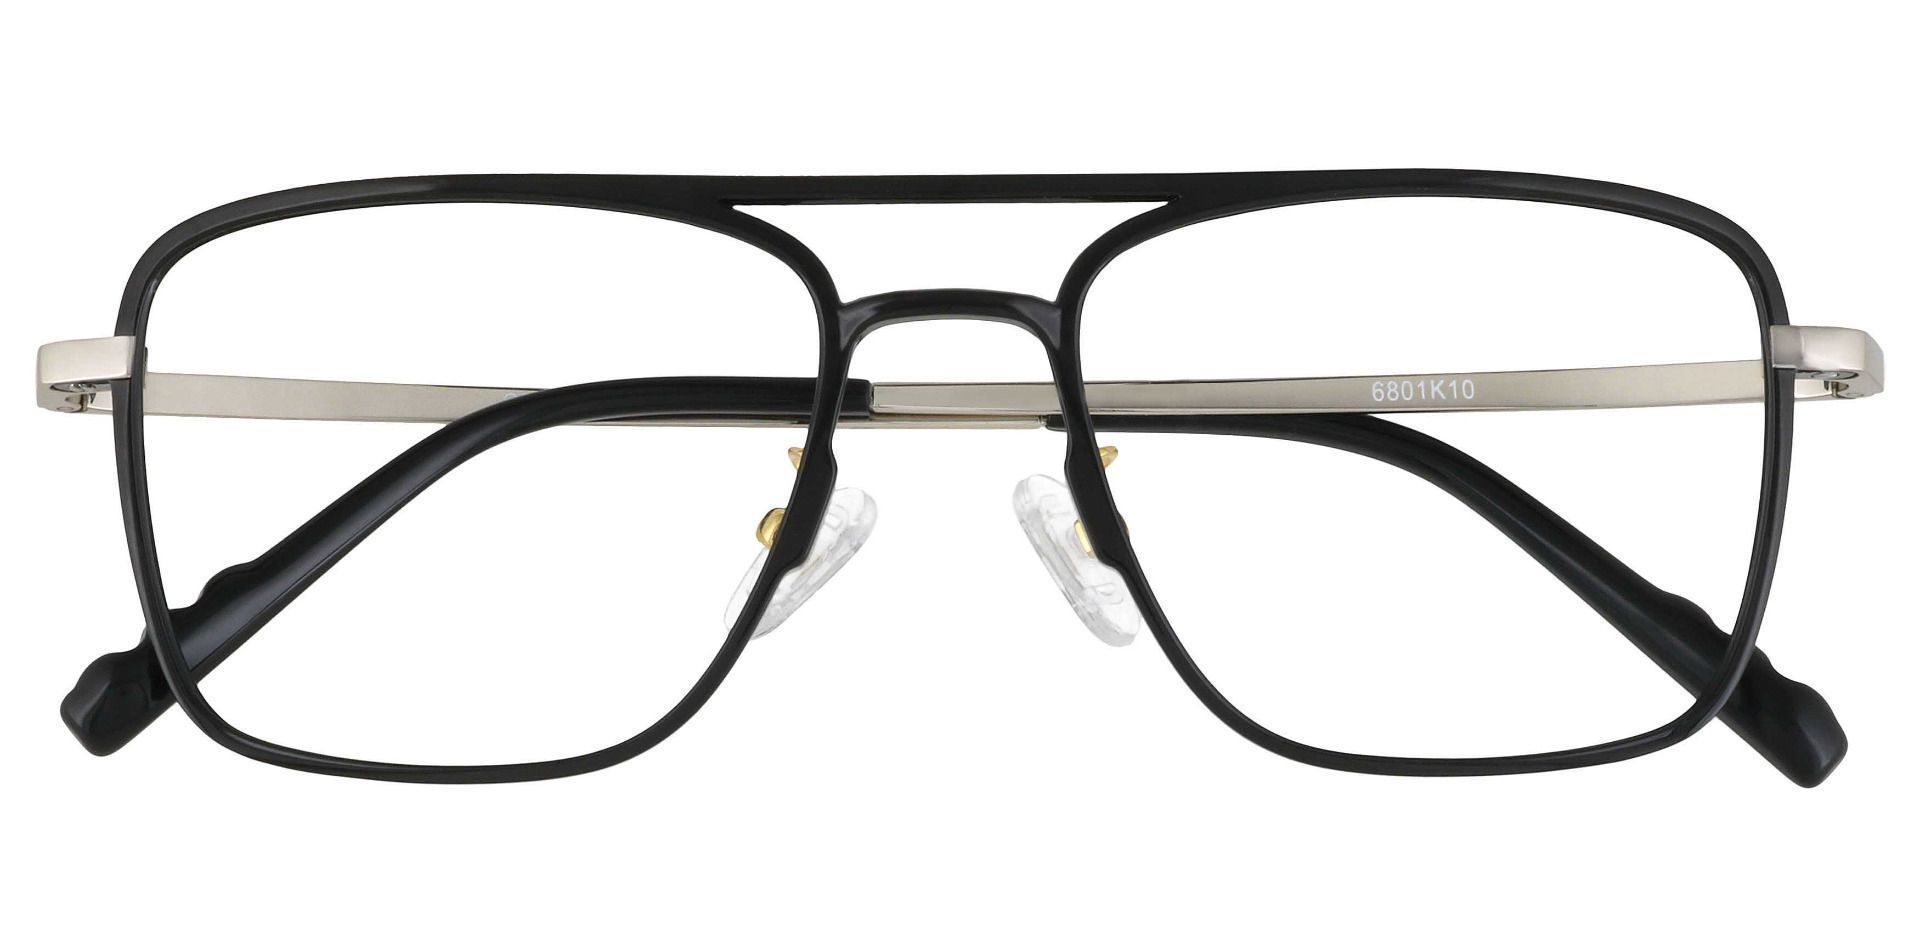 Largo Aviator Prescription Glasses - Black